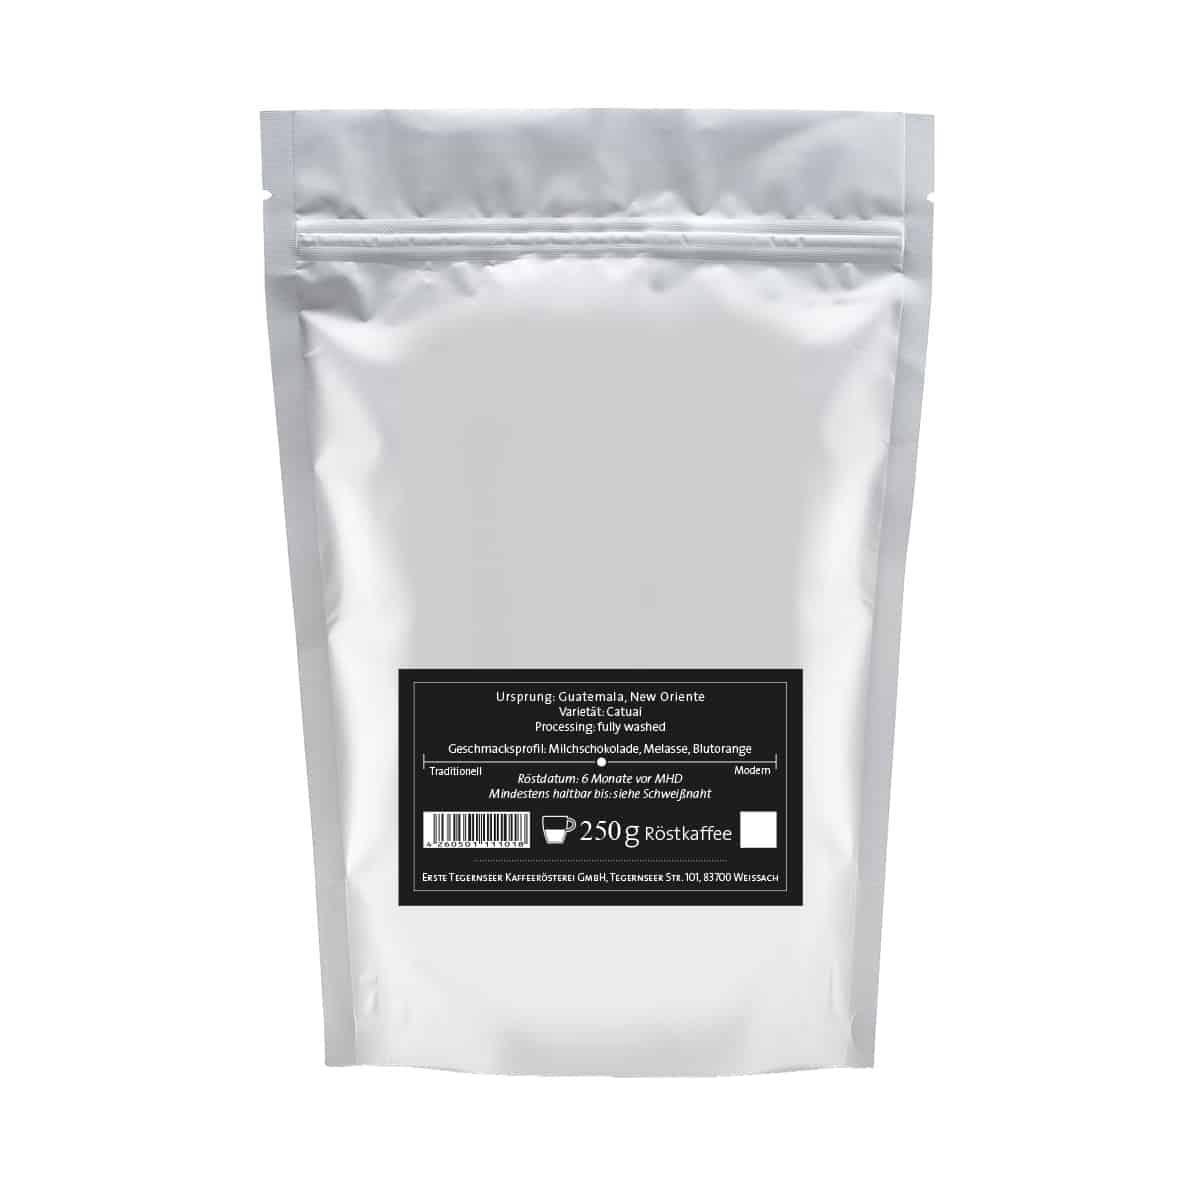 Filterkaffee-Guatemala-Finca-El-Gigante-Catuai-fully-washed-HINTEN